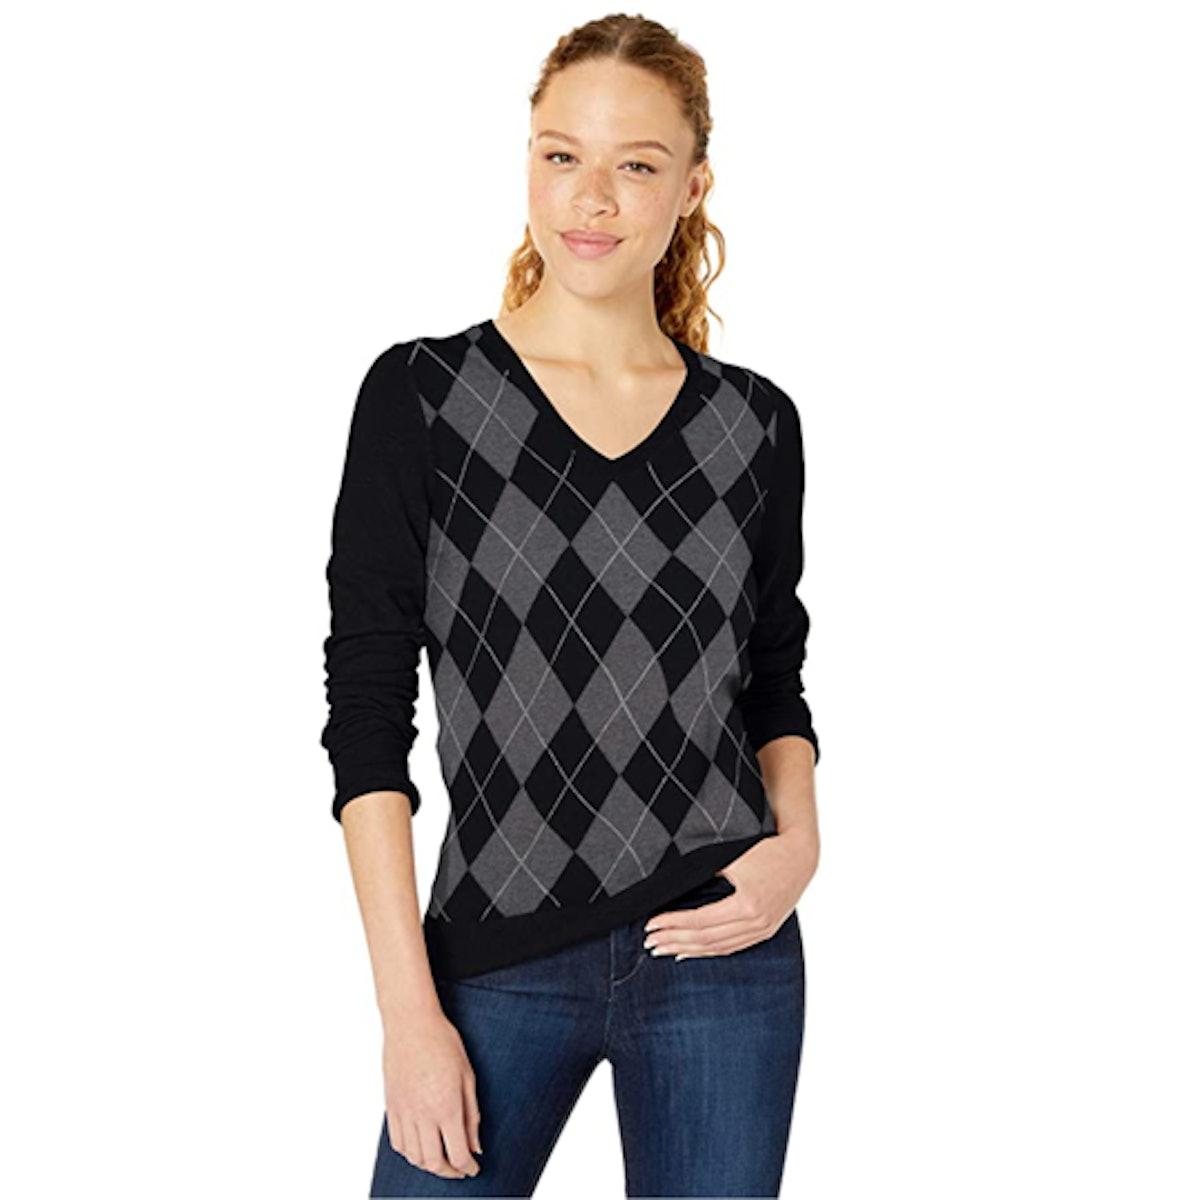 Amazon Essentials Classic Fit V-Neck Sweater